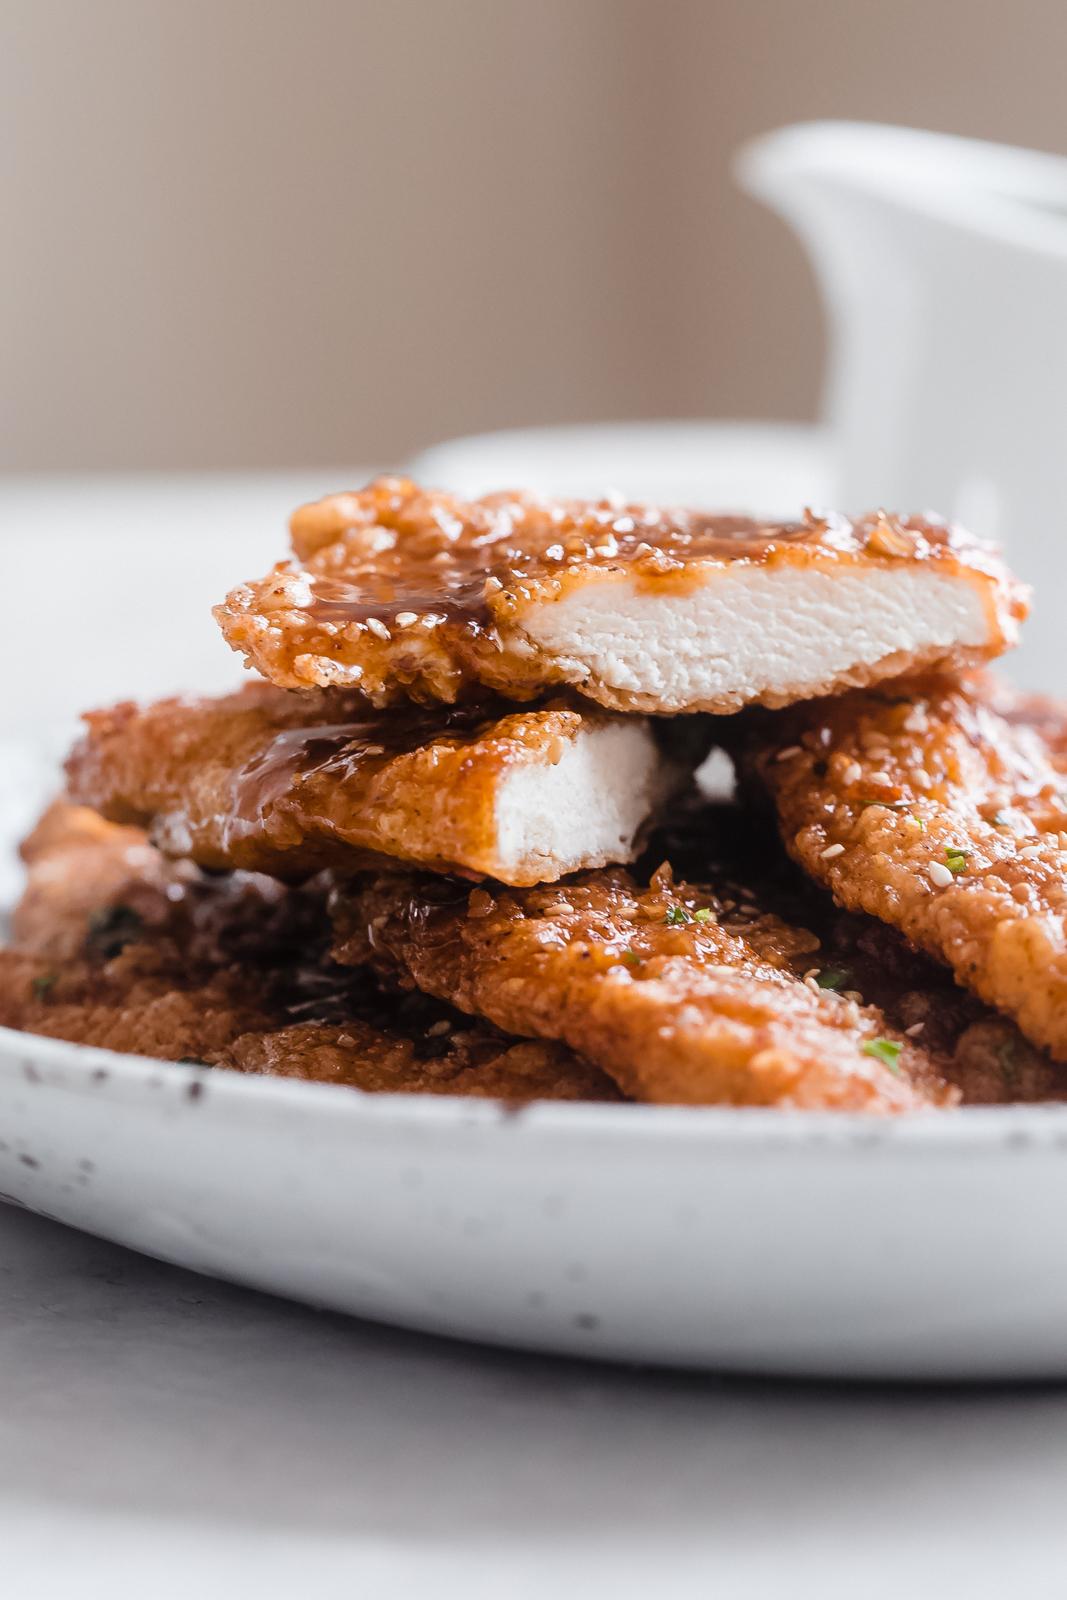 crispy honey garlic chicken sliced to show cooked chicken inside